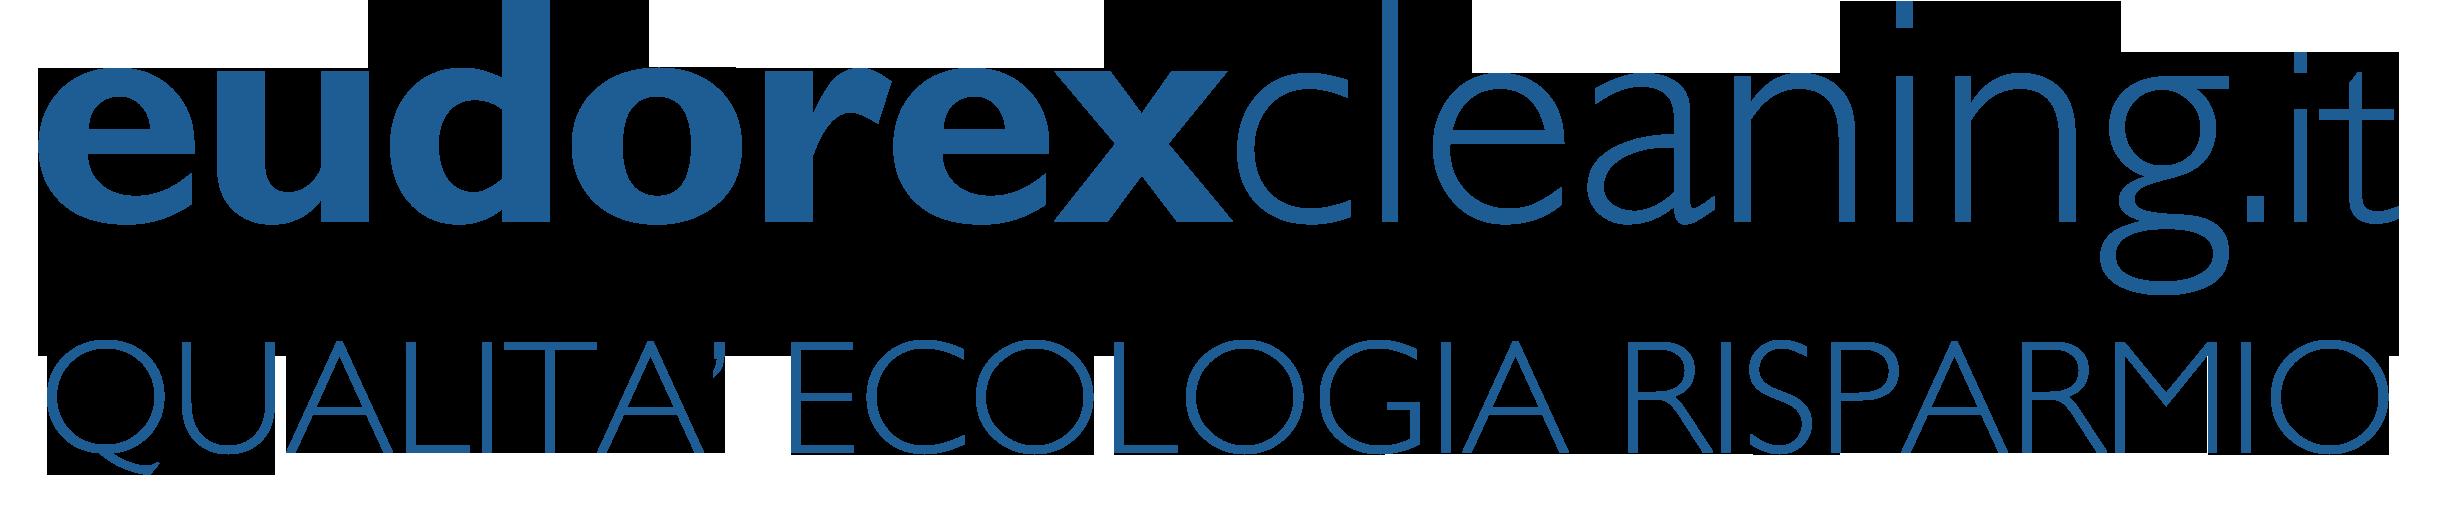 logo-eudorex_cleaning